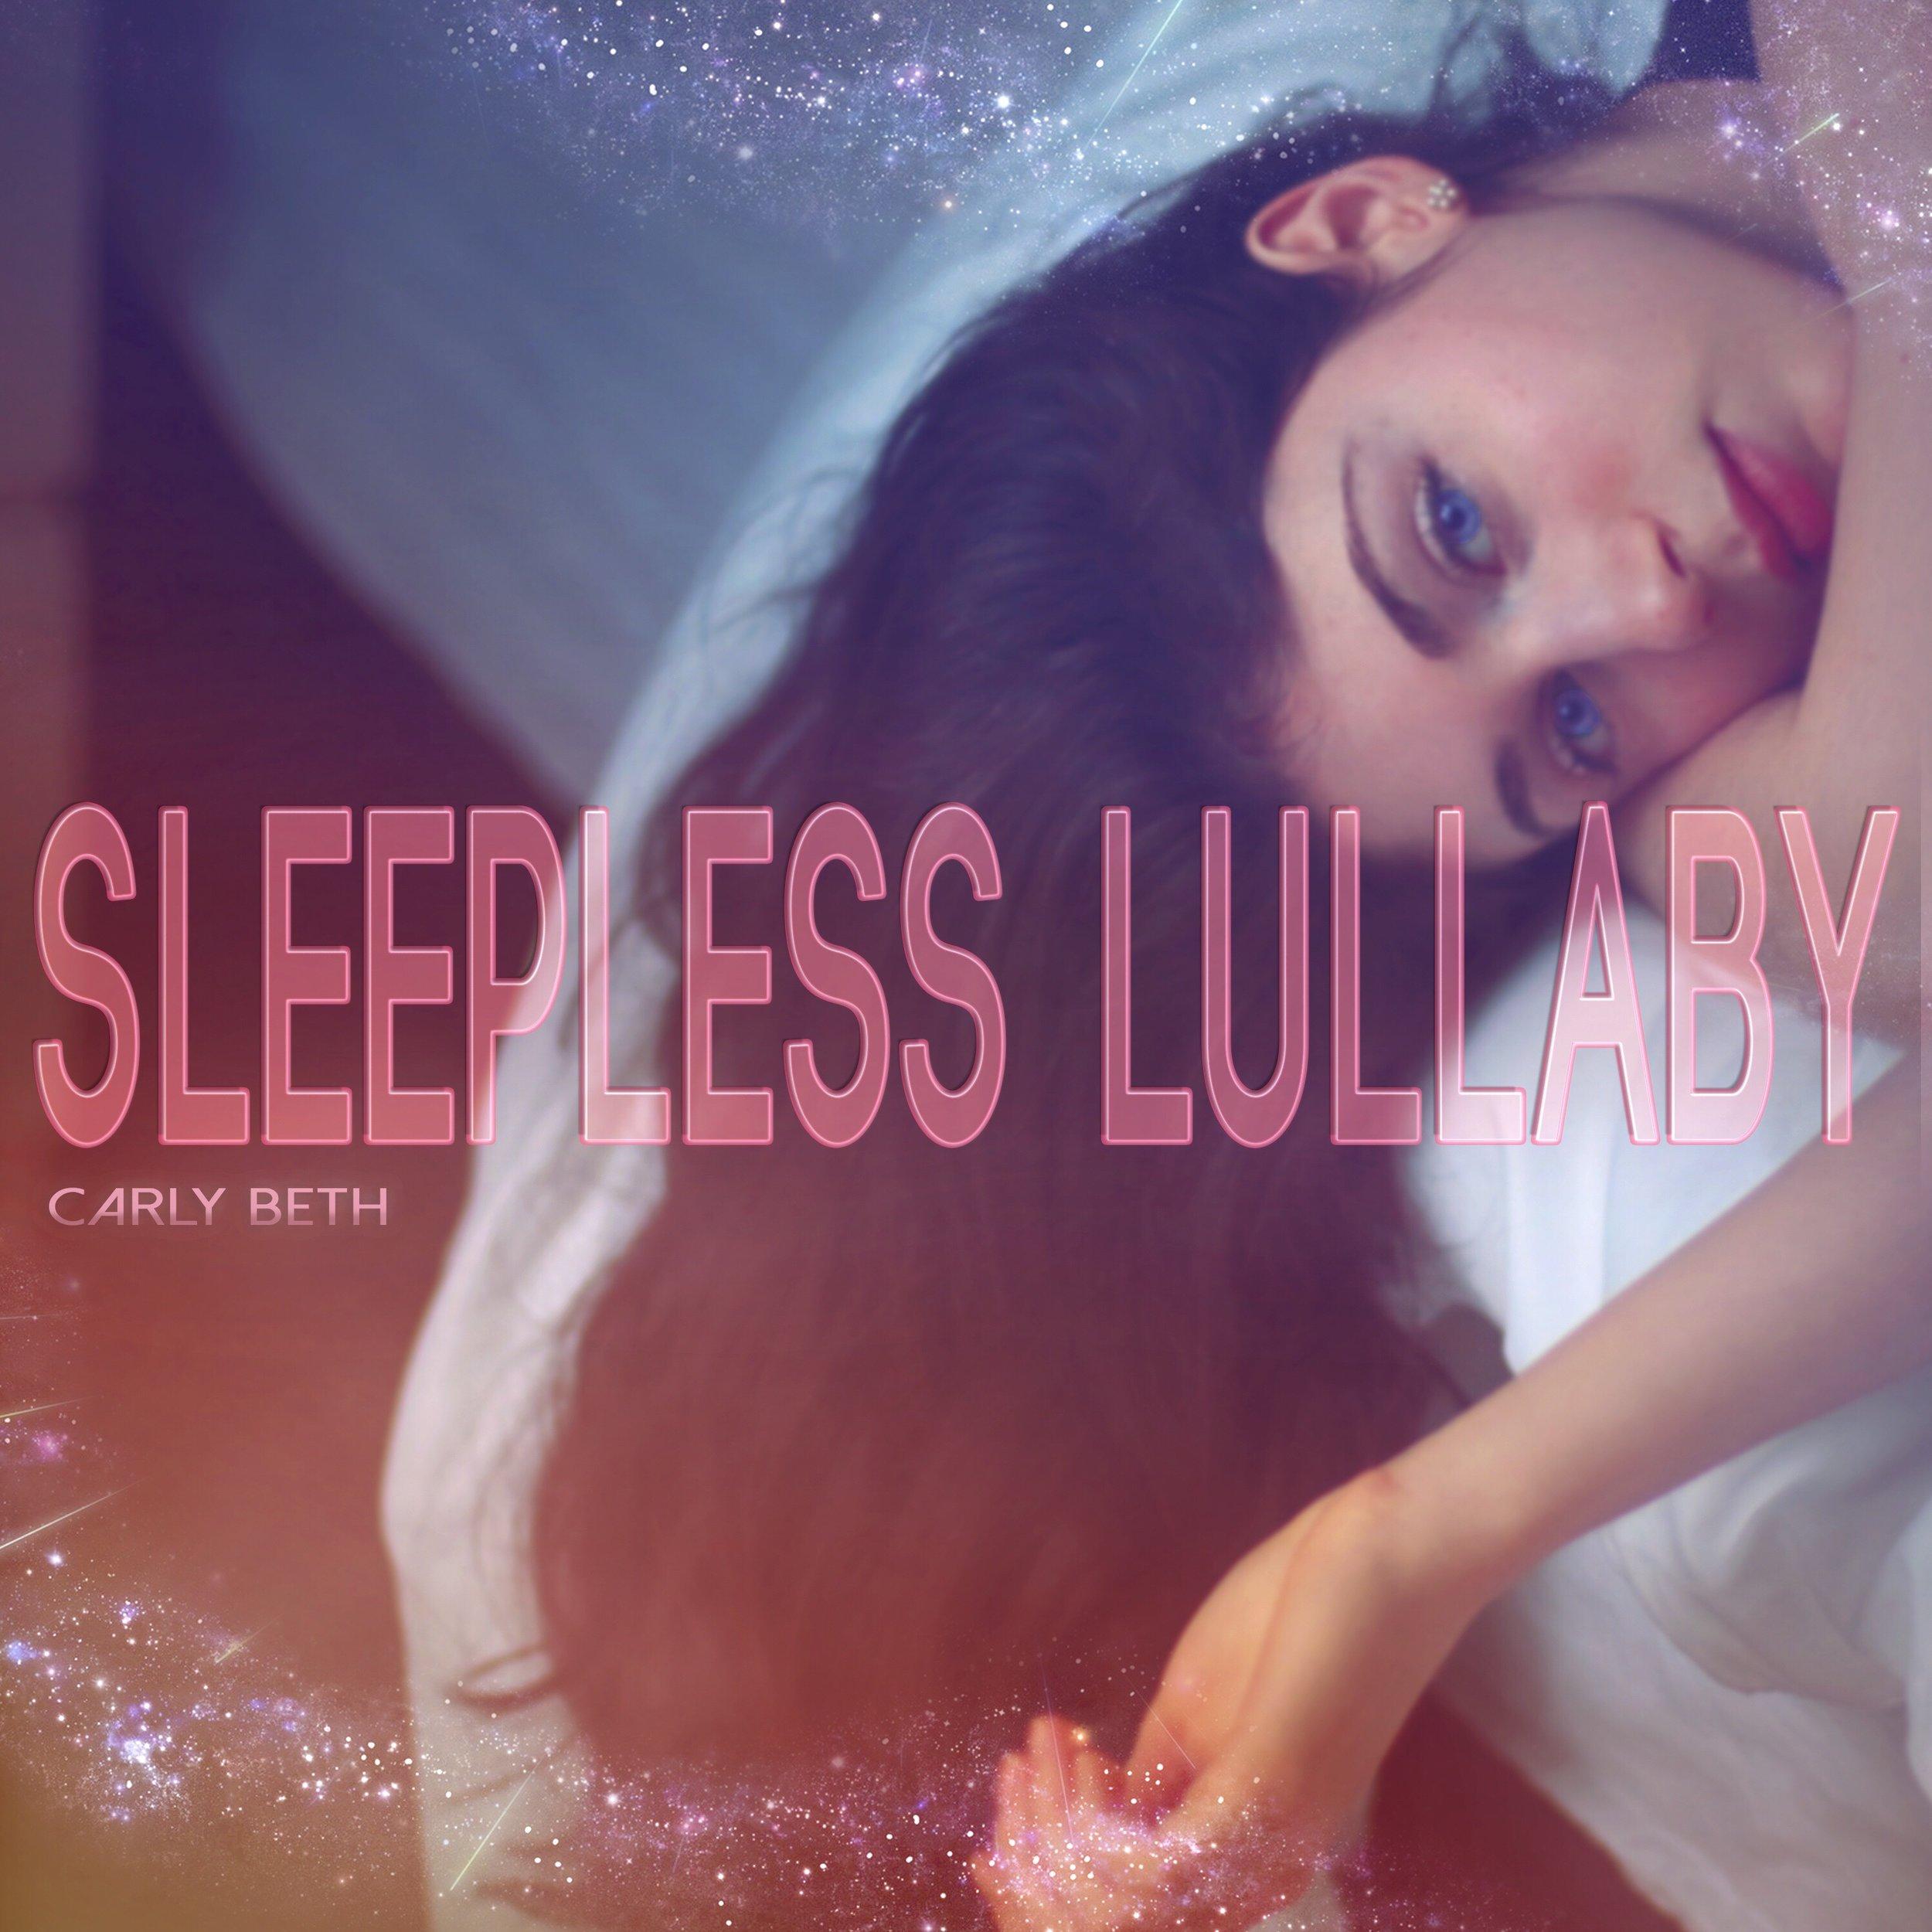 Sleepless Lullaby - Carly Beth